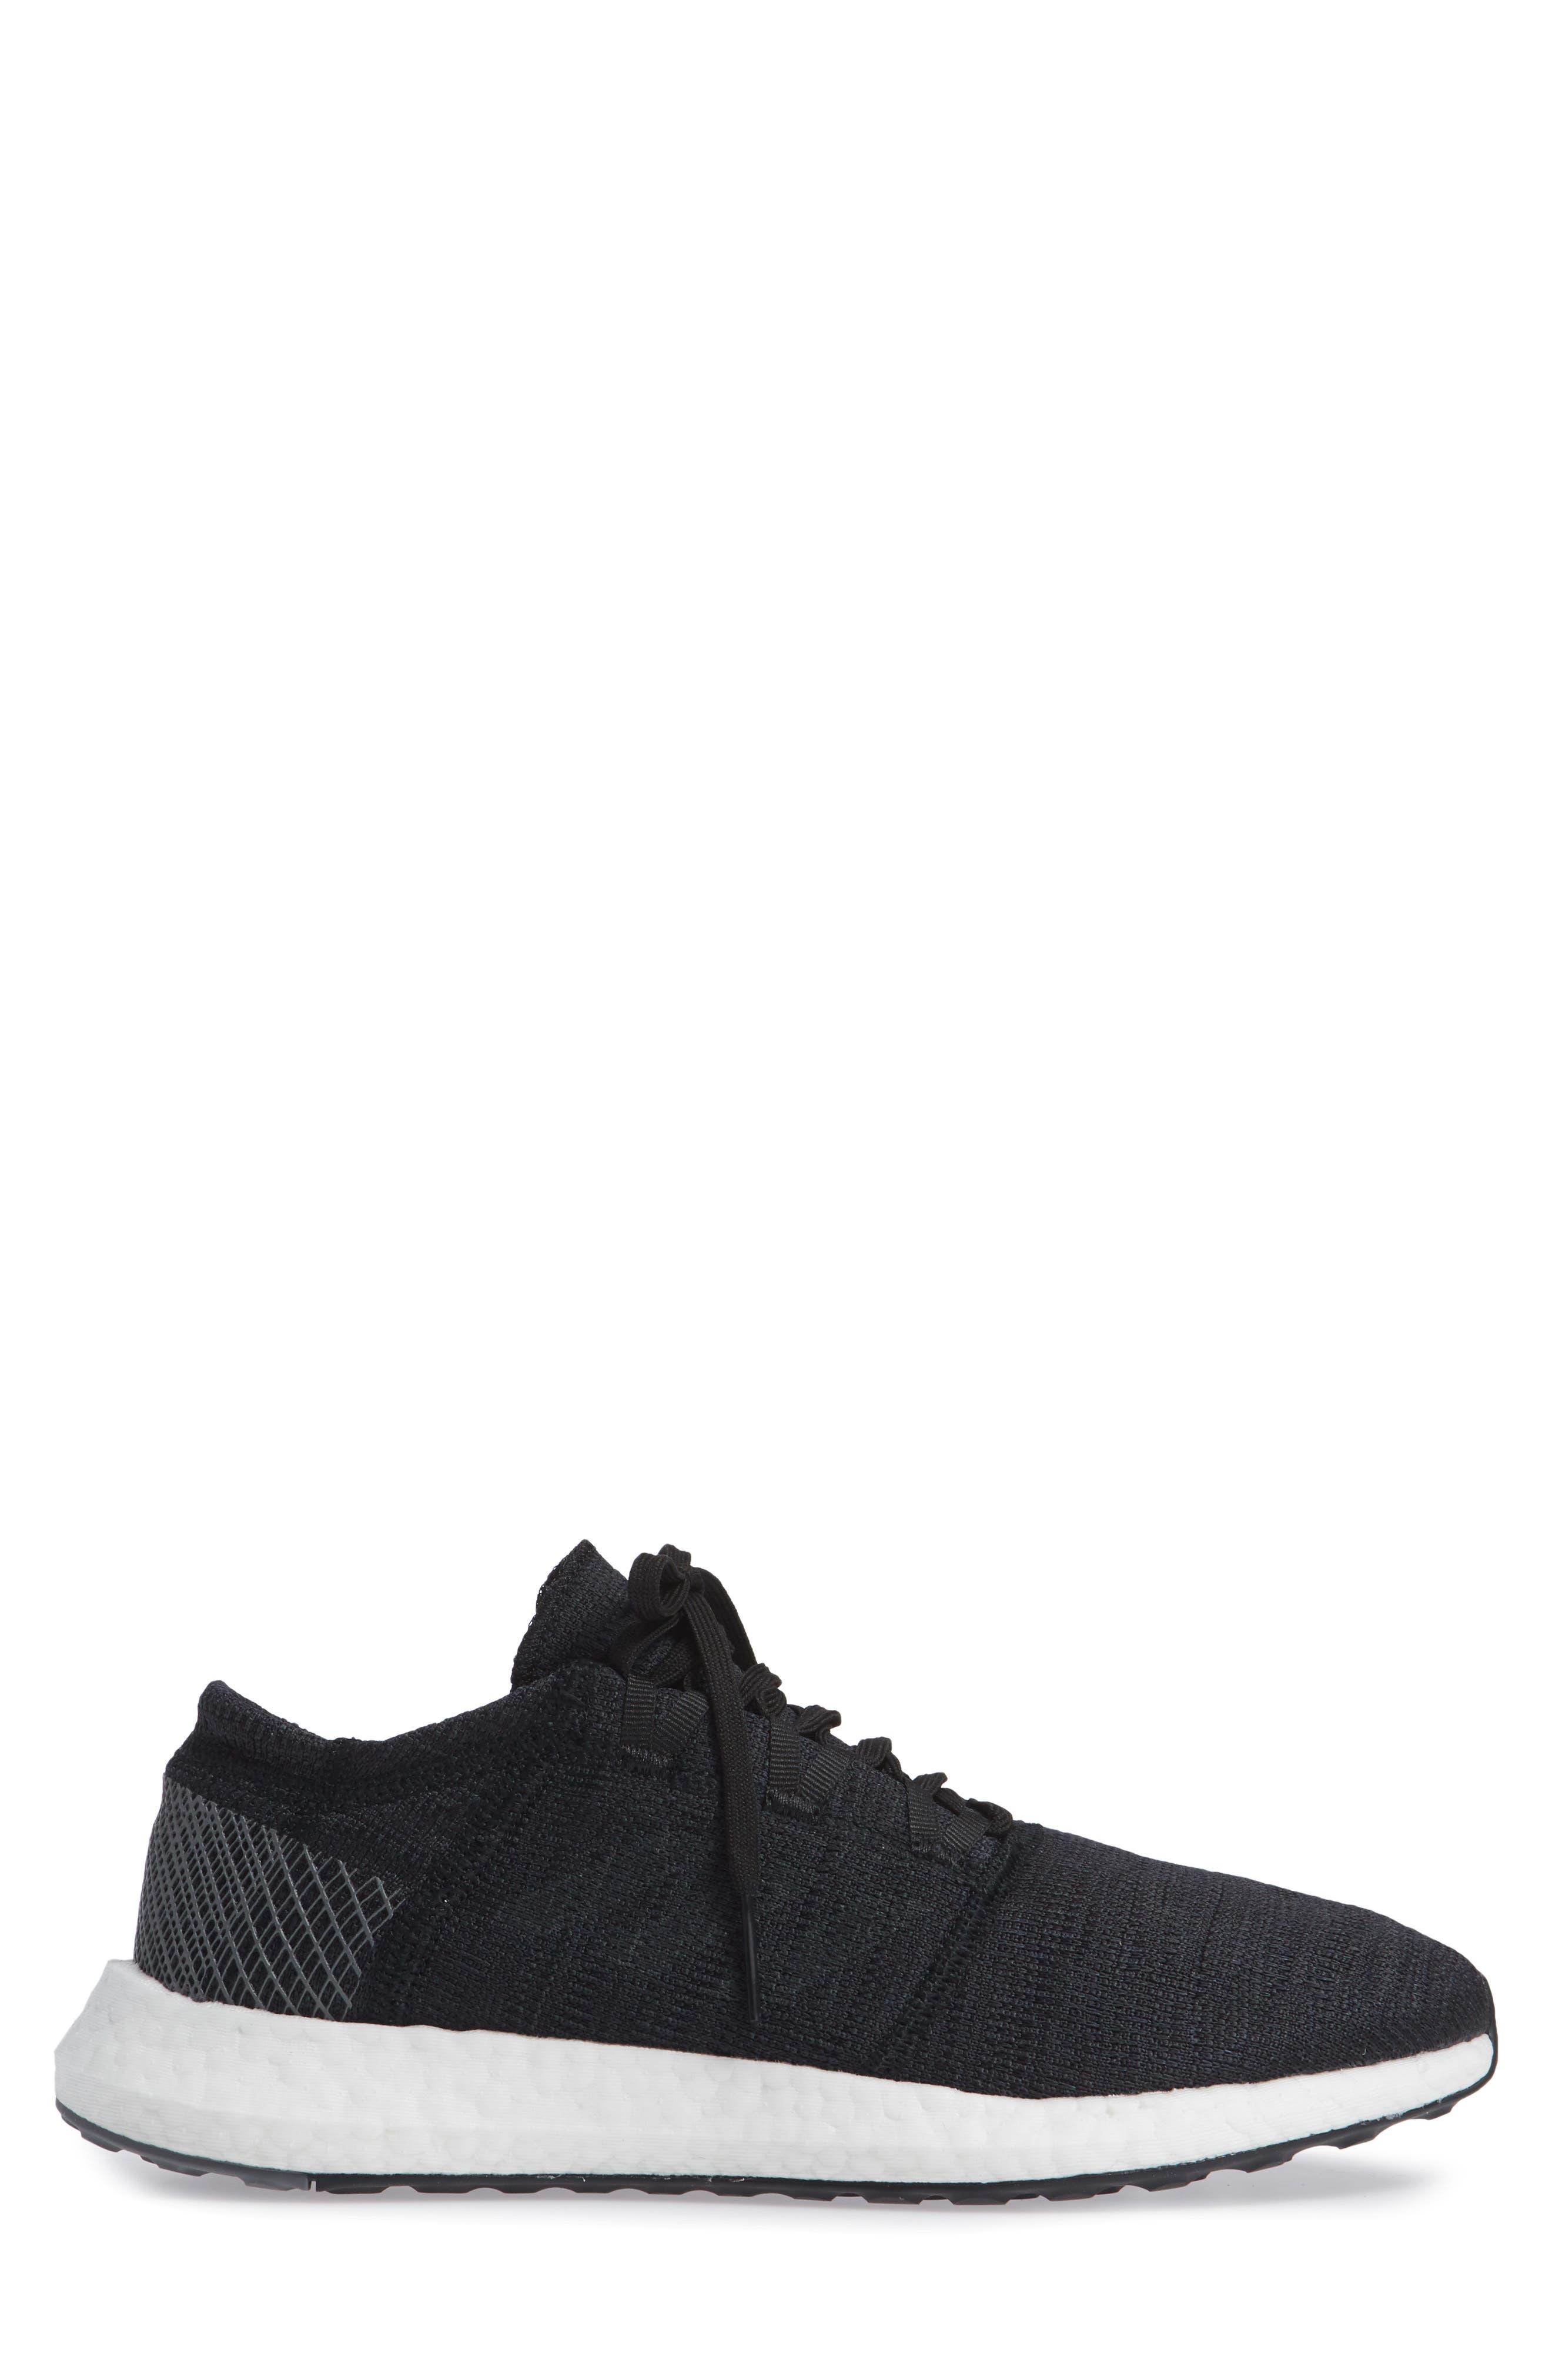 PureBoost GO Running Shoe,                             Alternate thumbnail 3, color,                             BLACK/ GREY